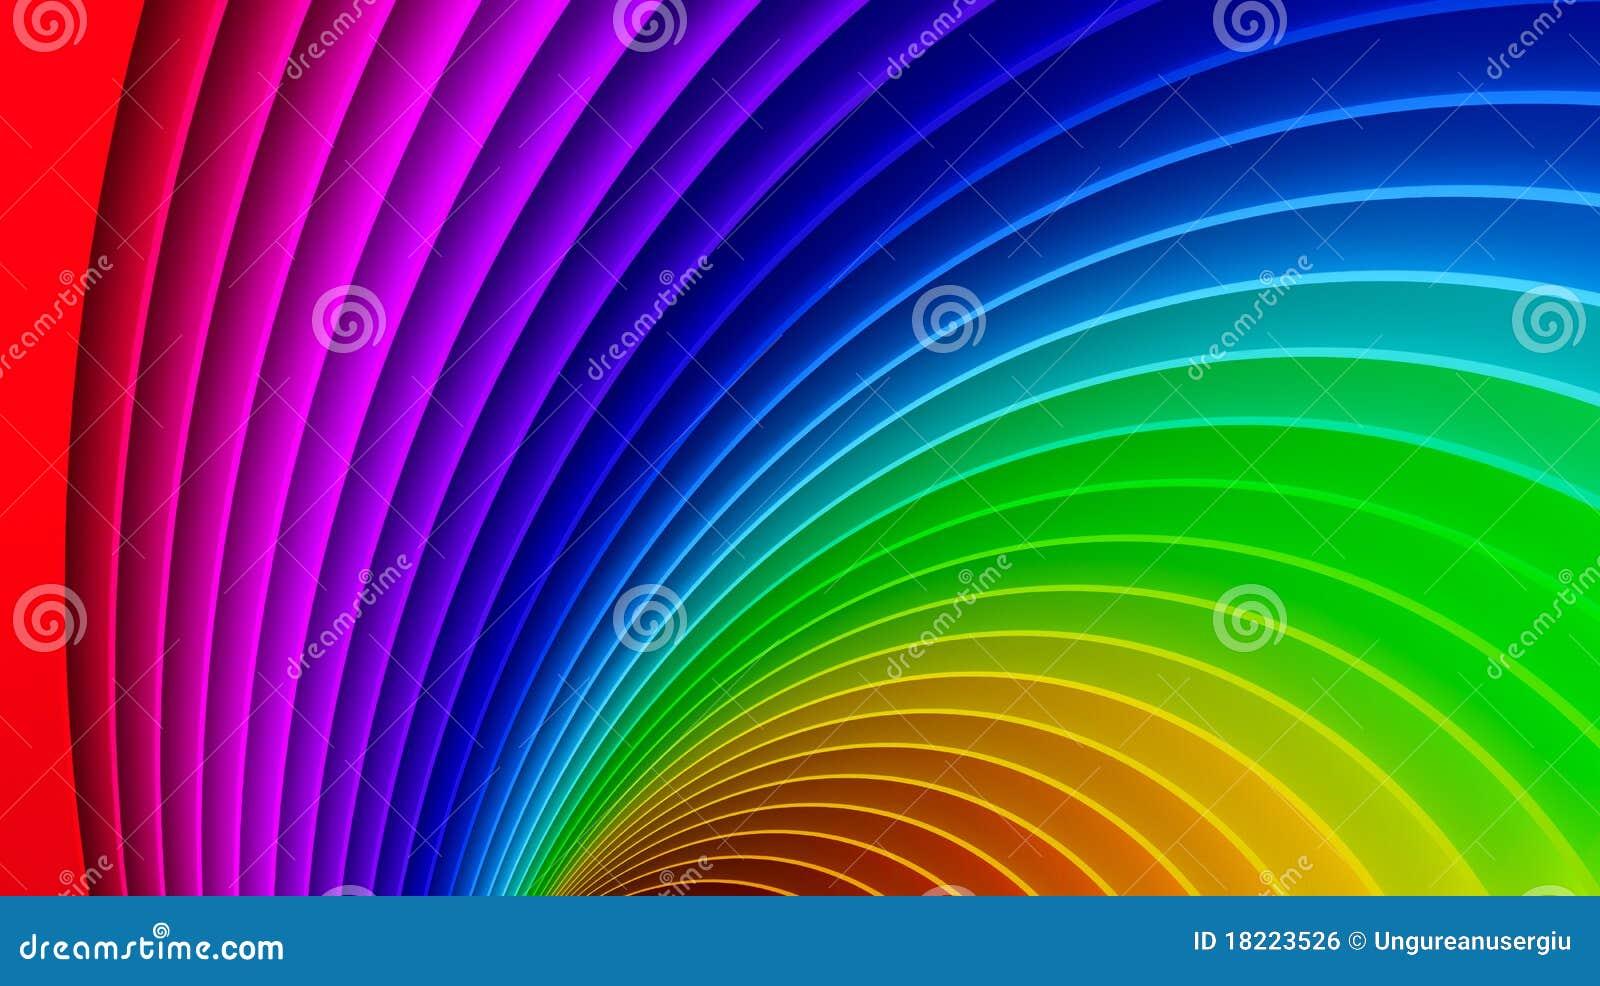 Awesome 3d Rainbow Background Stock Illustration